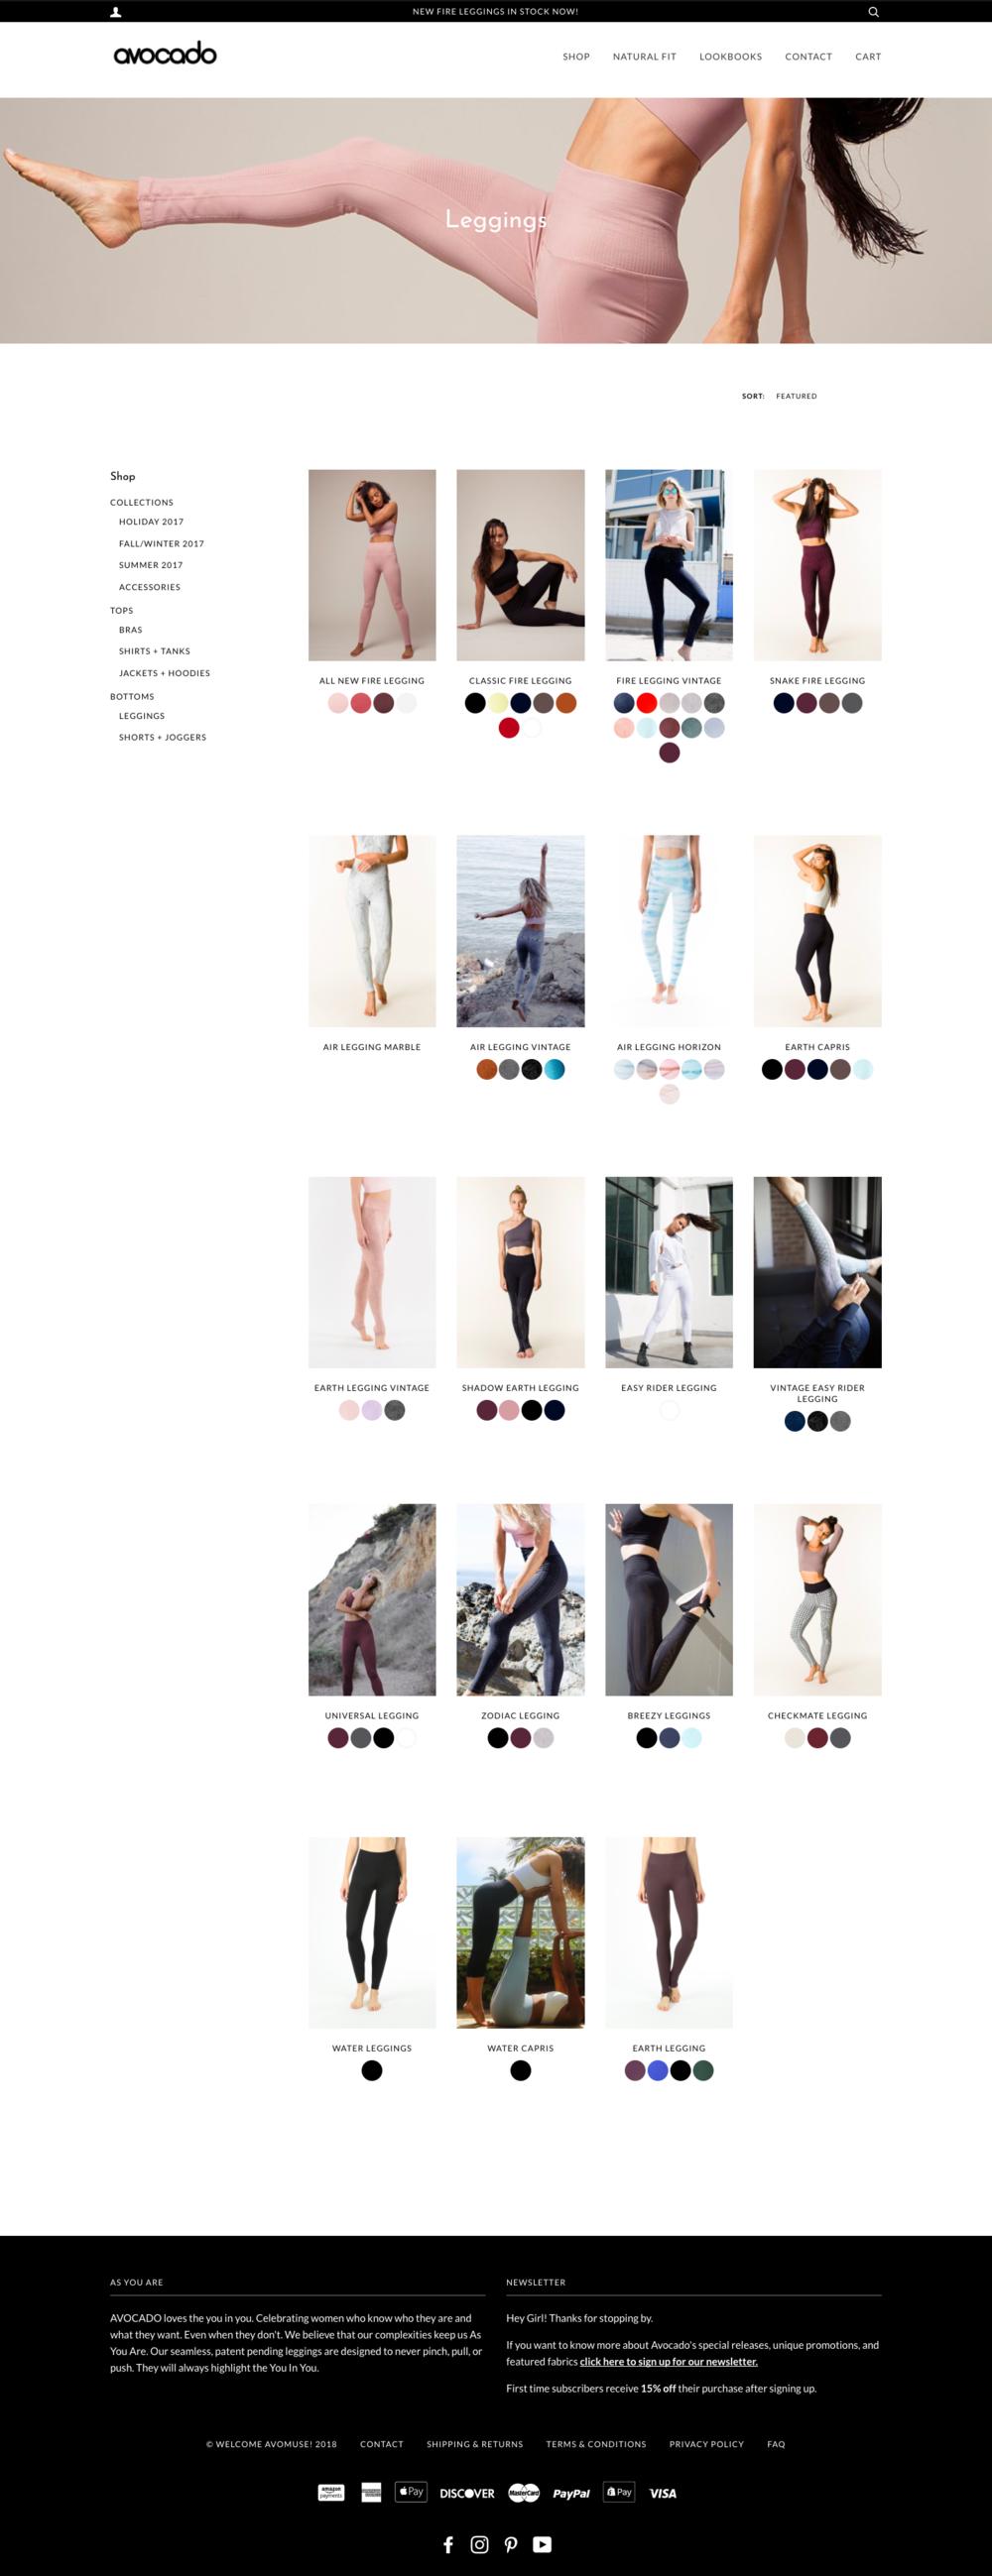 screencapture-shopavocado-collections-leggings-1517360110459.png